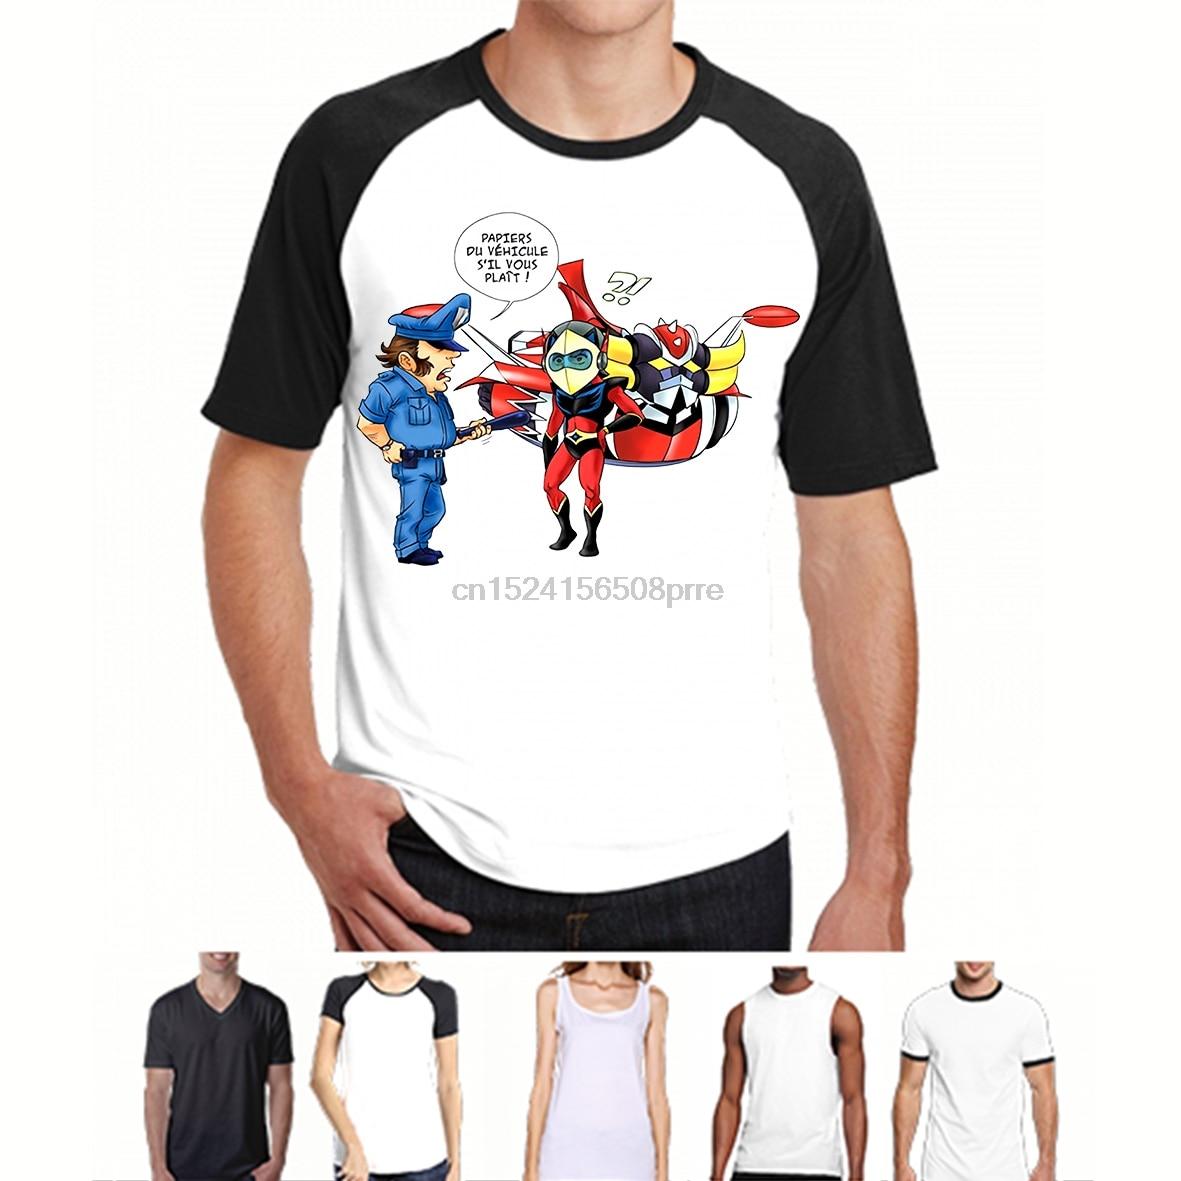 t-shirt batman m?ska